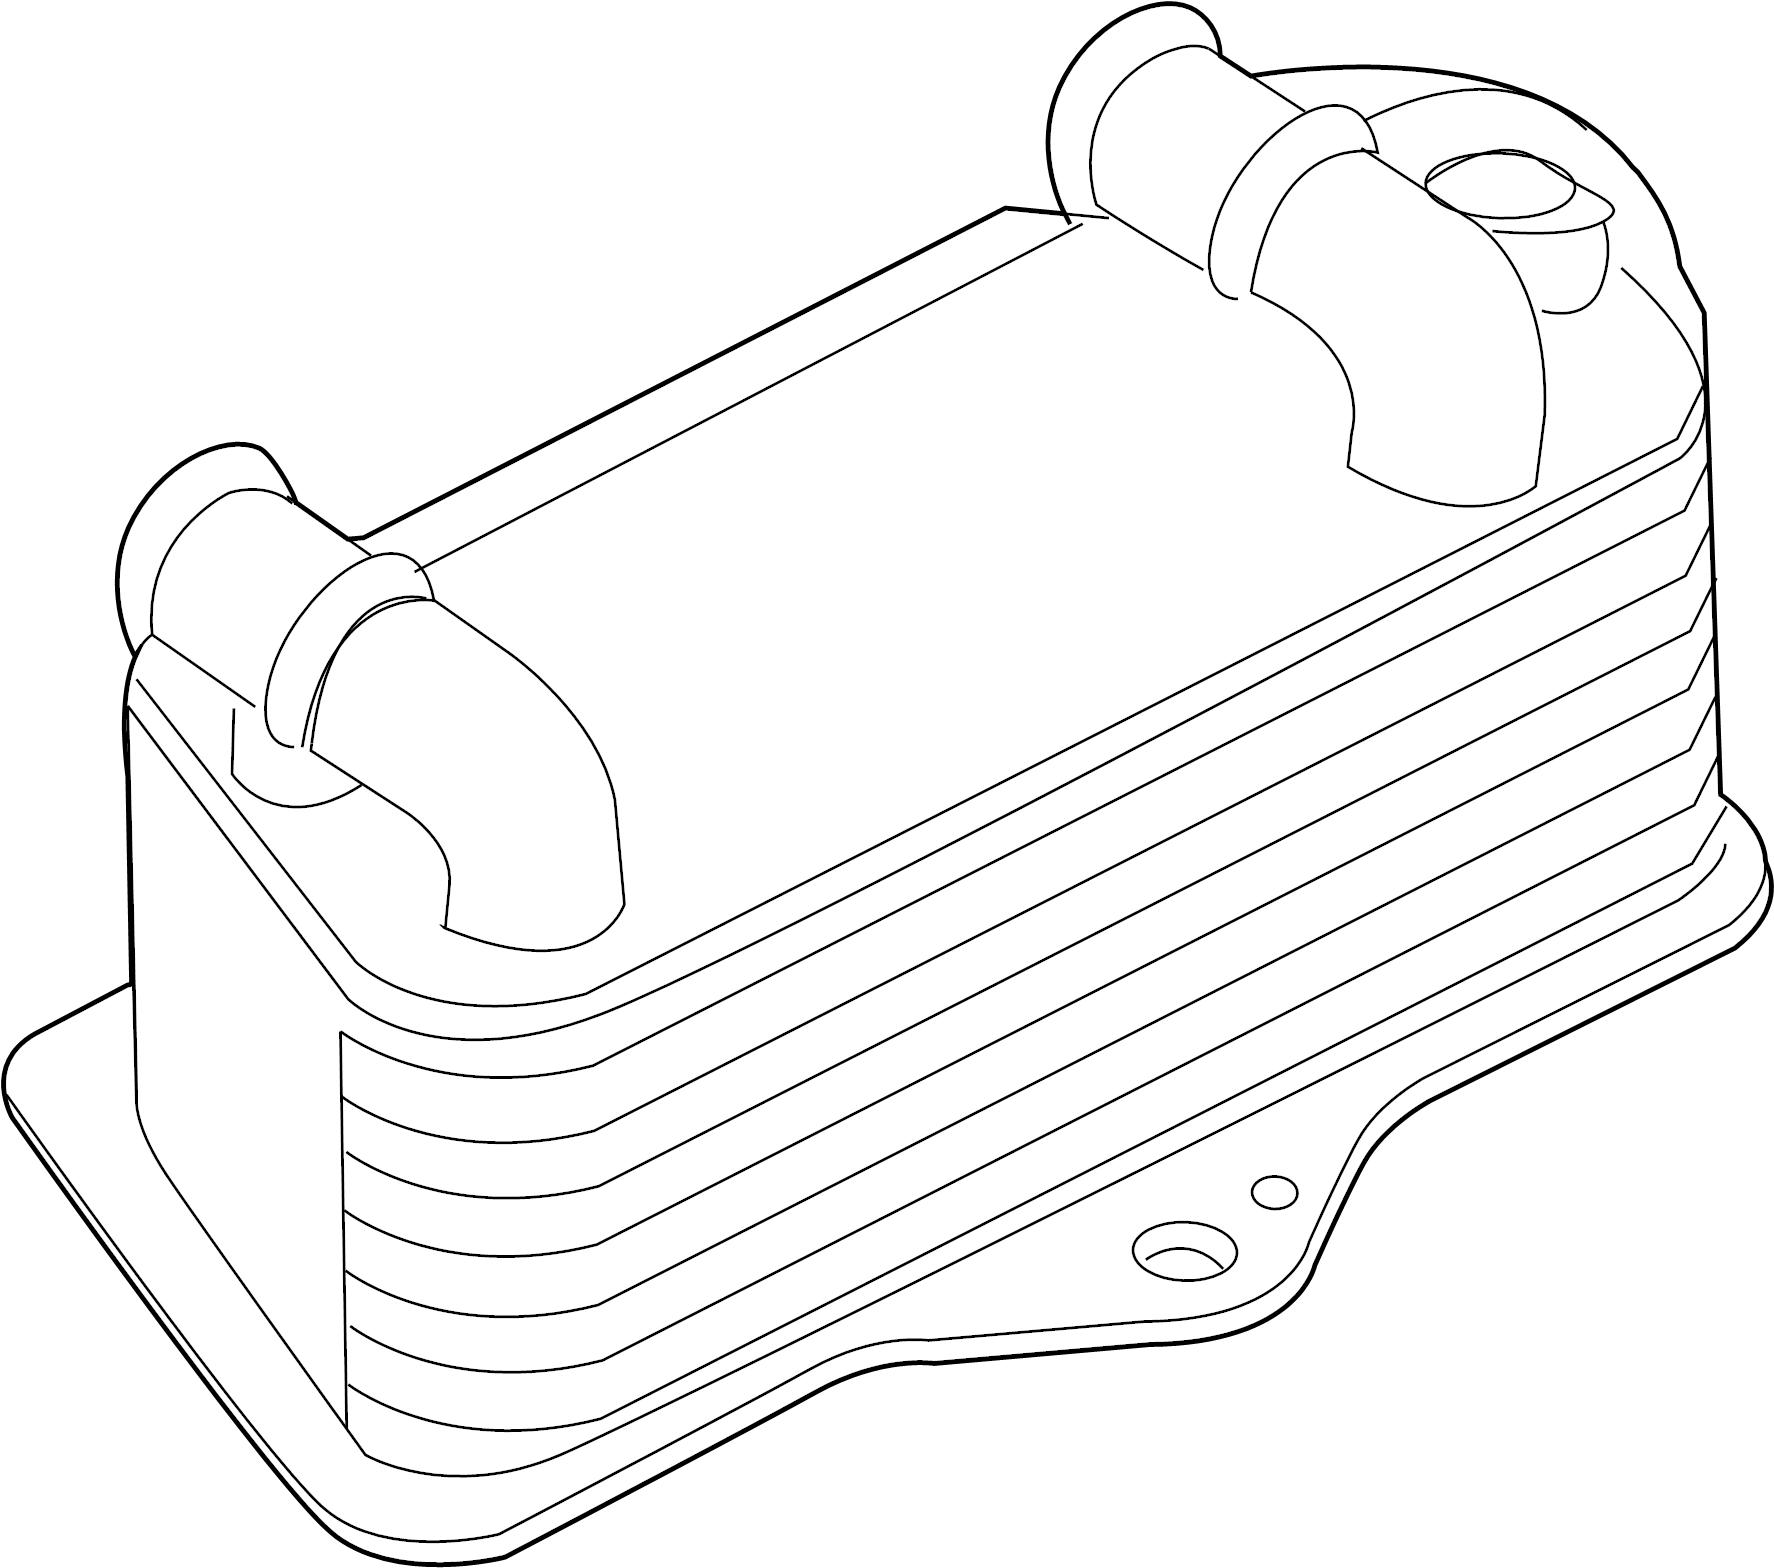 Audi TT Automatic Transmission Oil Cooler. 2009-2010 W/AWD